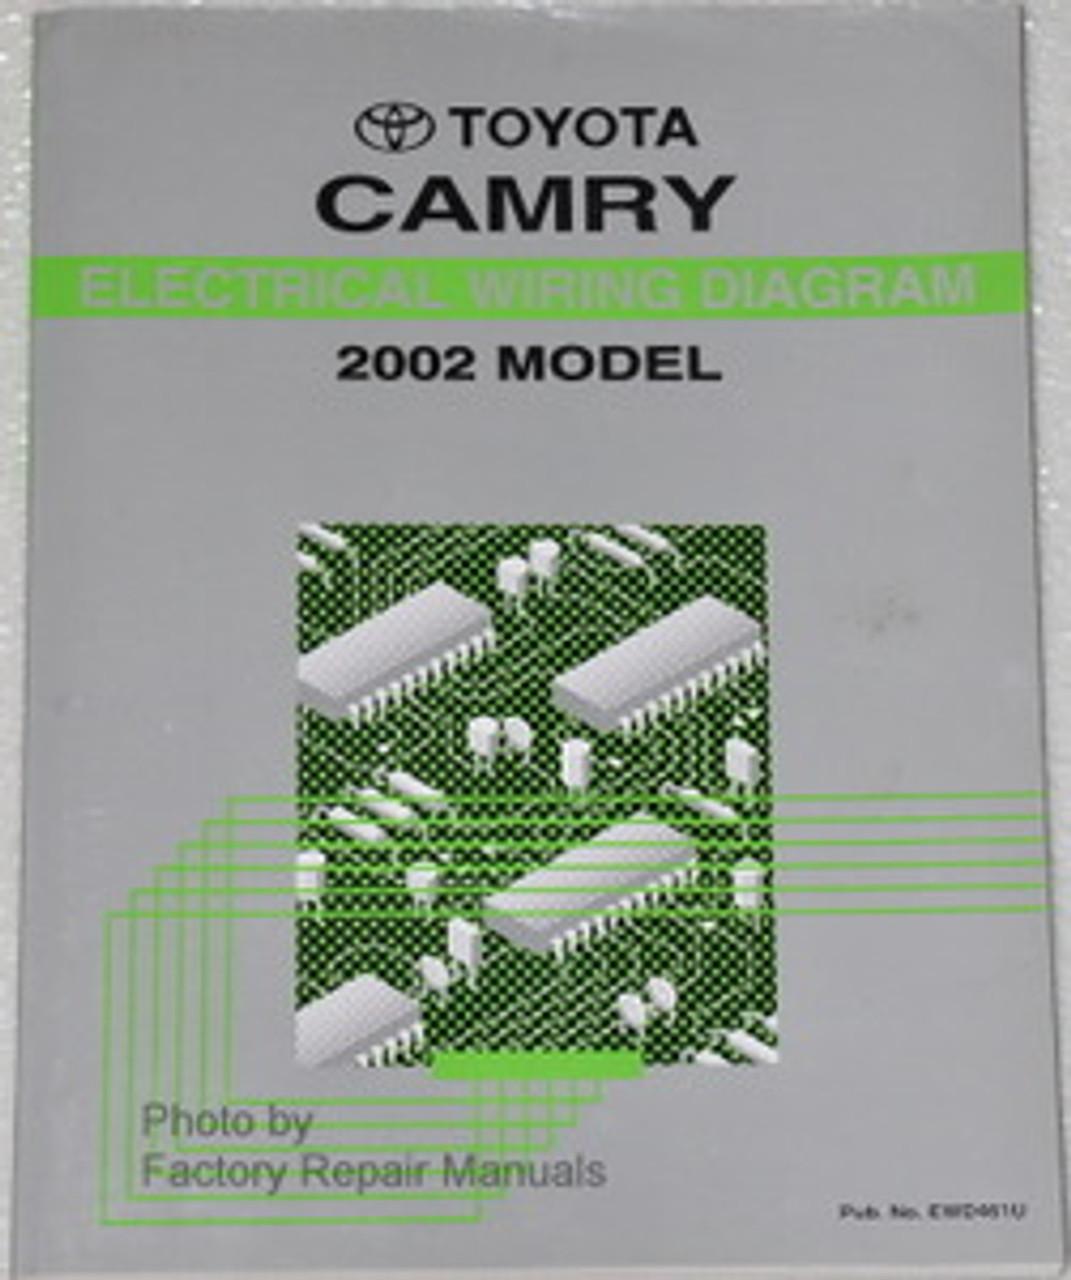 1997 Toyota Camry Radio Wiring Harness from cdn11.bigcommerce.com